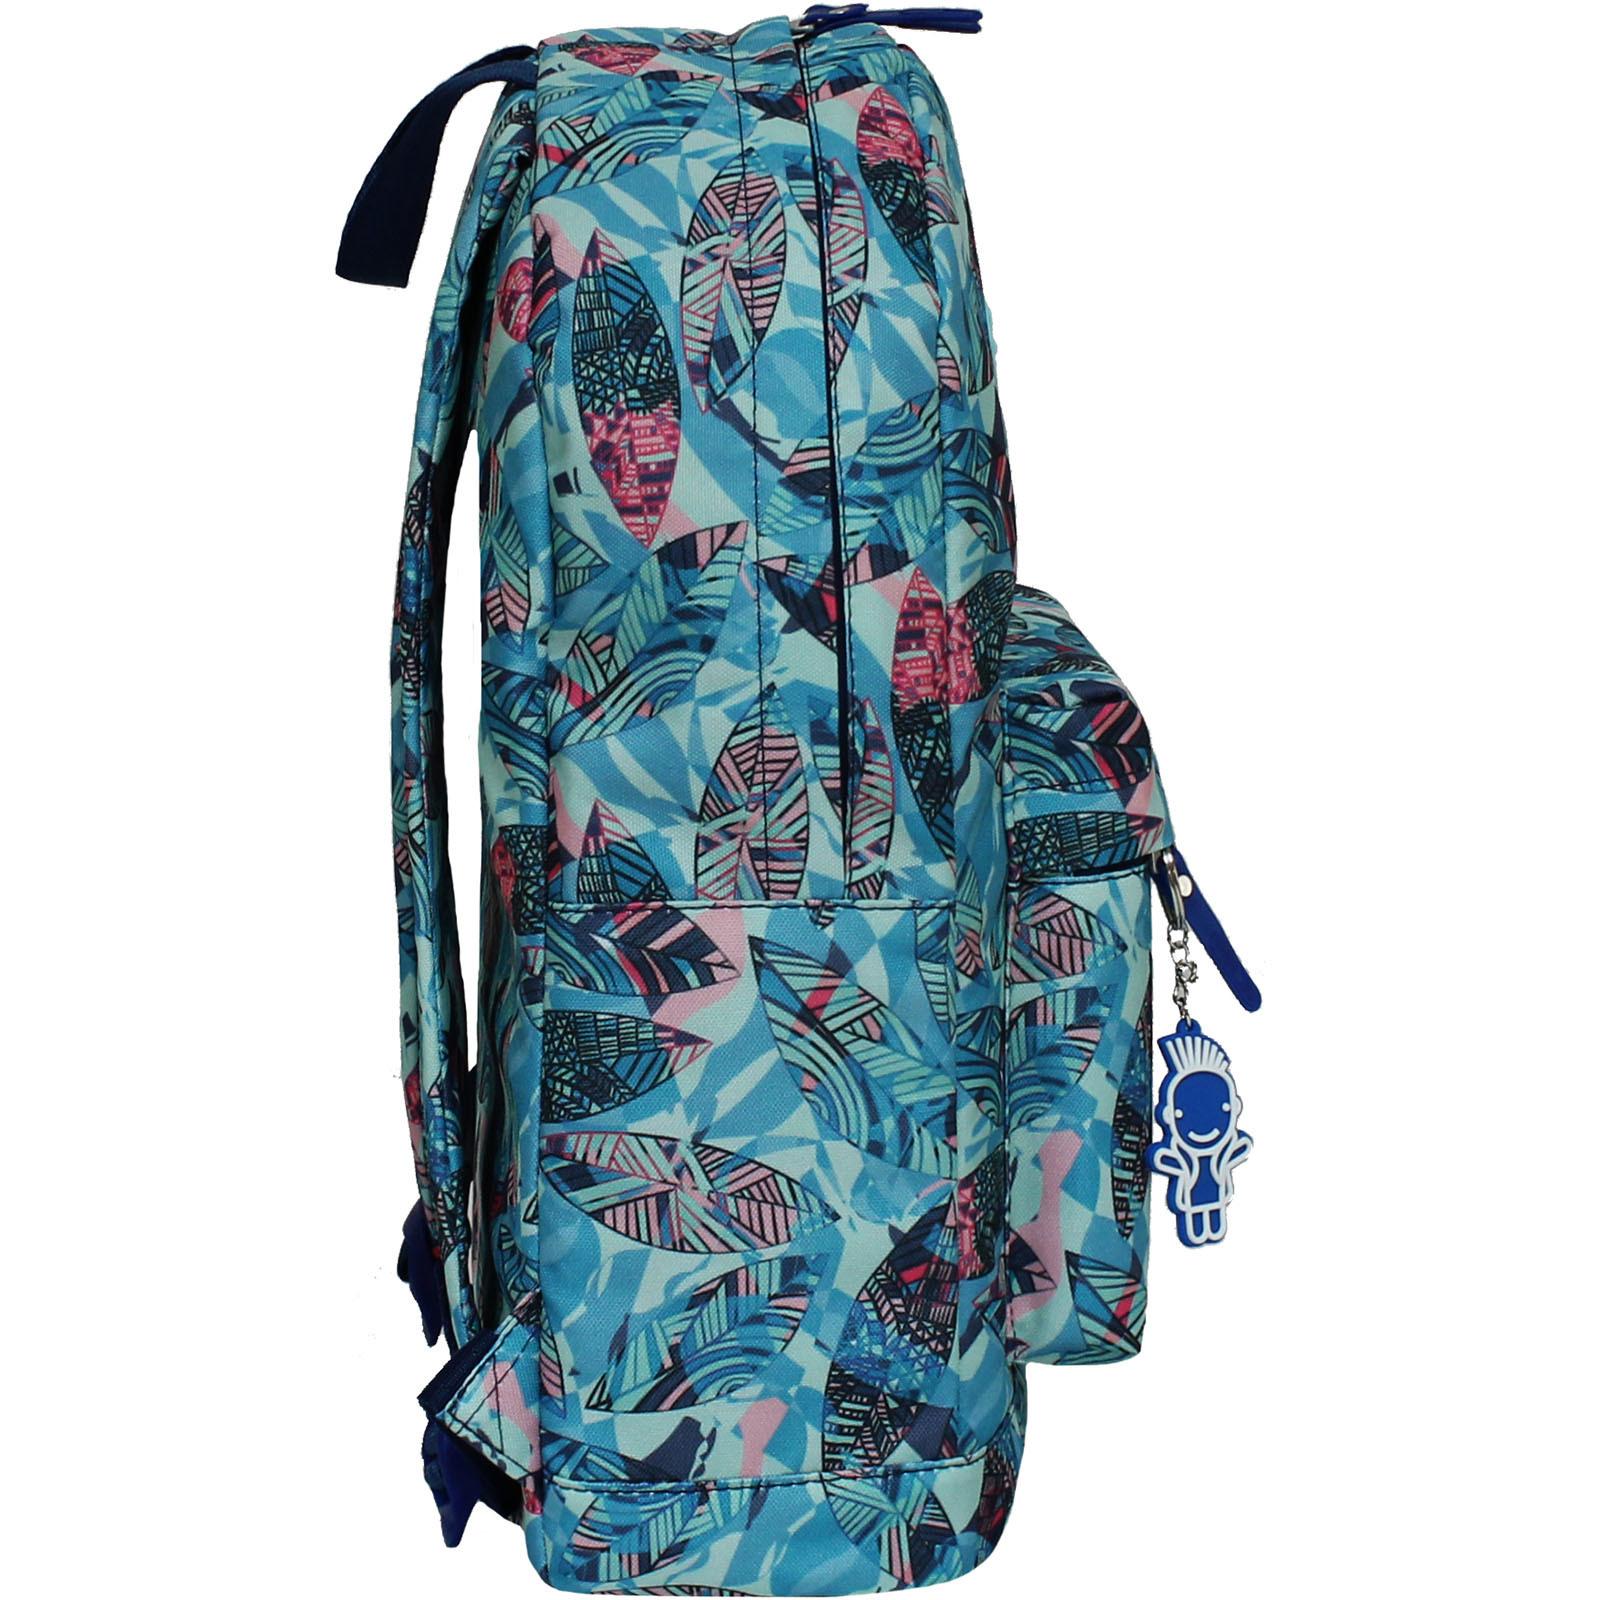 Рюкзак Bagland Молодежный (дизайн) 17 л. сублимация 210 (00533664)